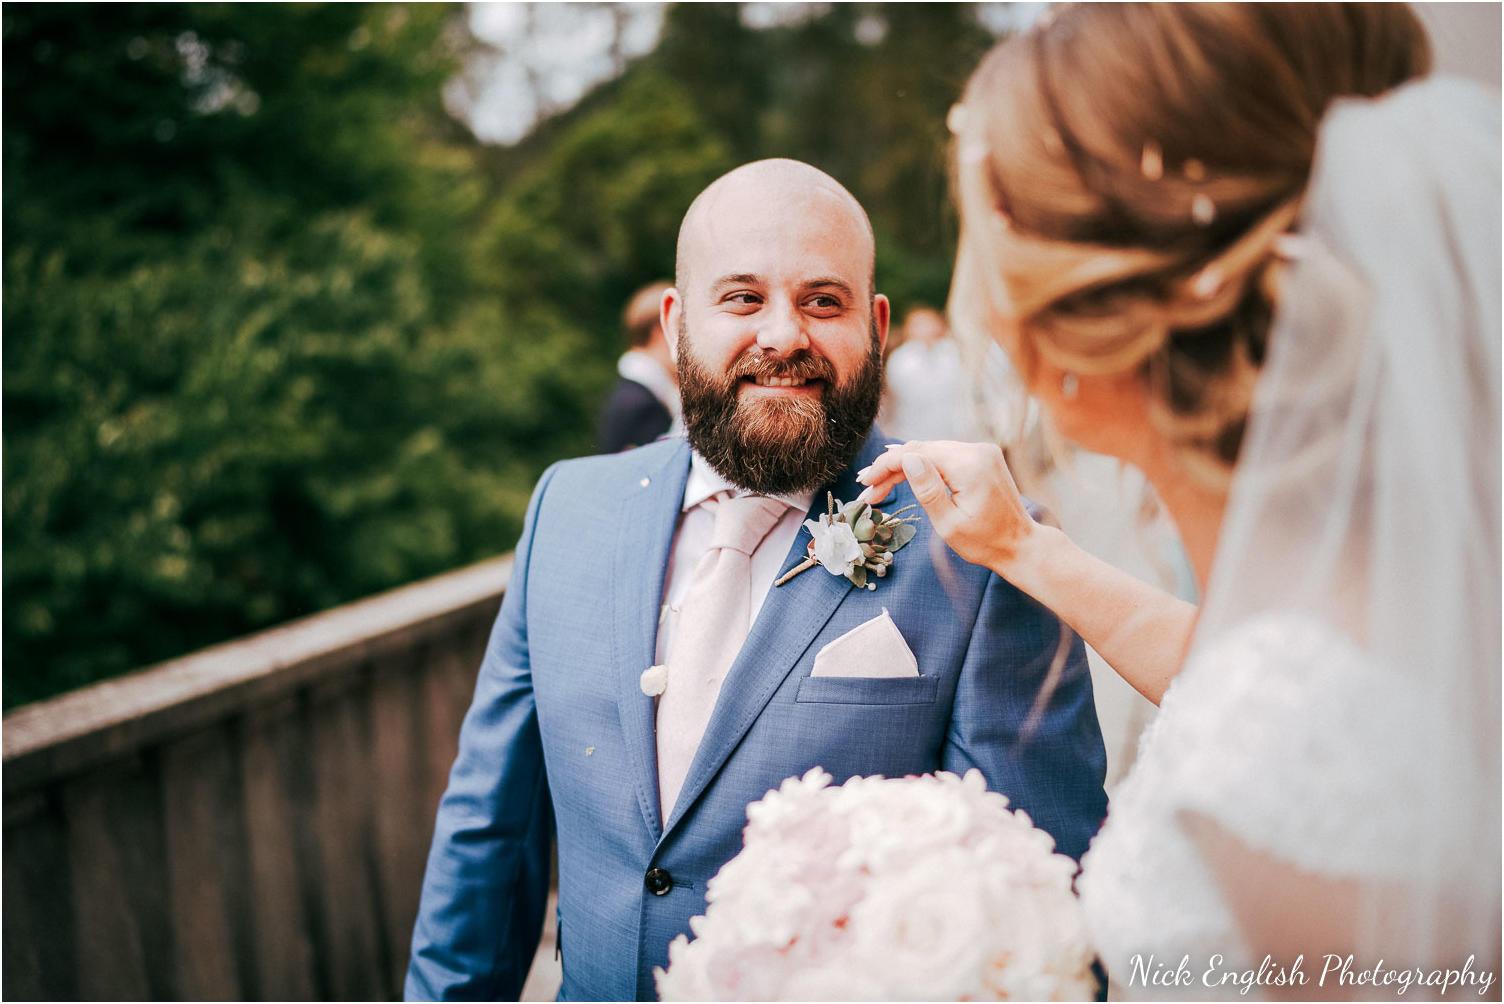 Destination_Wedding_Photographer_Slovenia_Nick_English_Photography-58.jpg